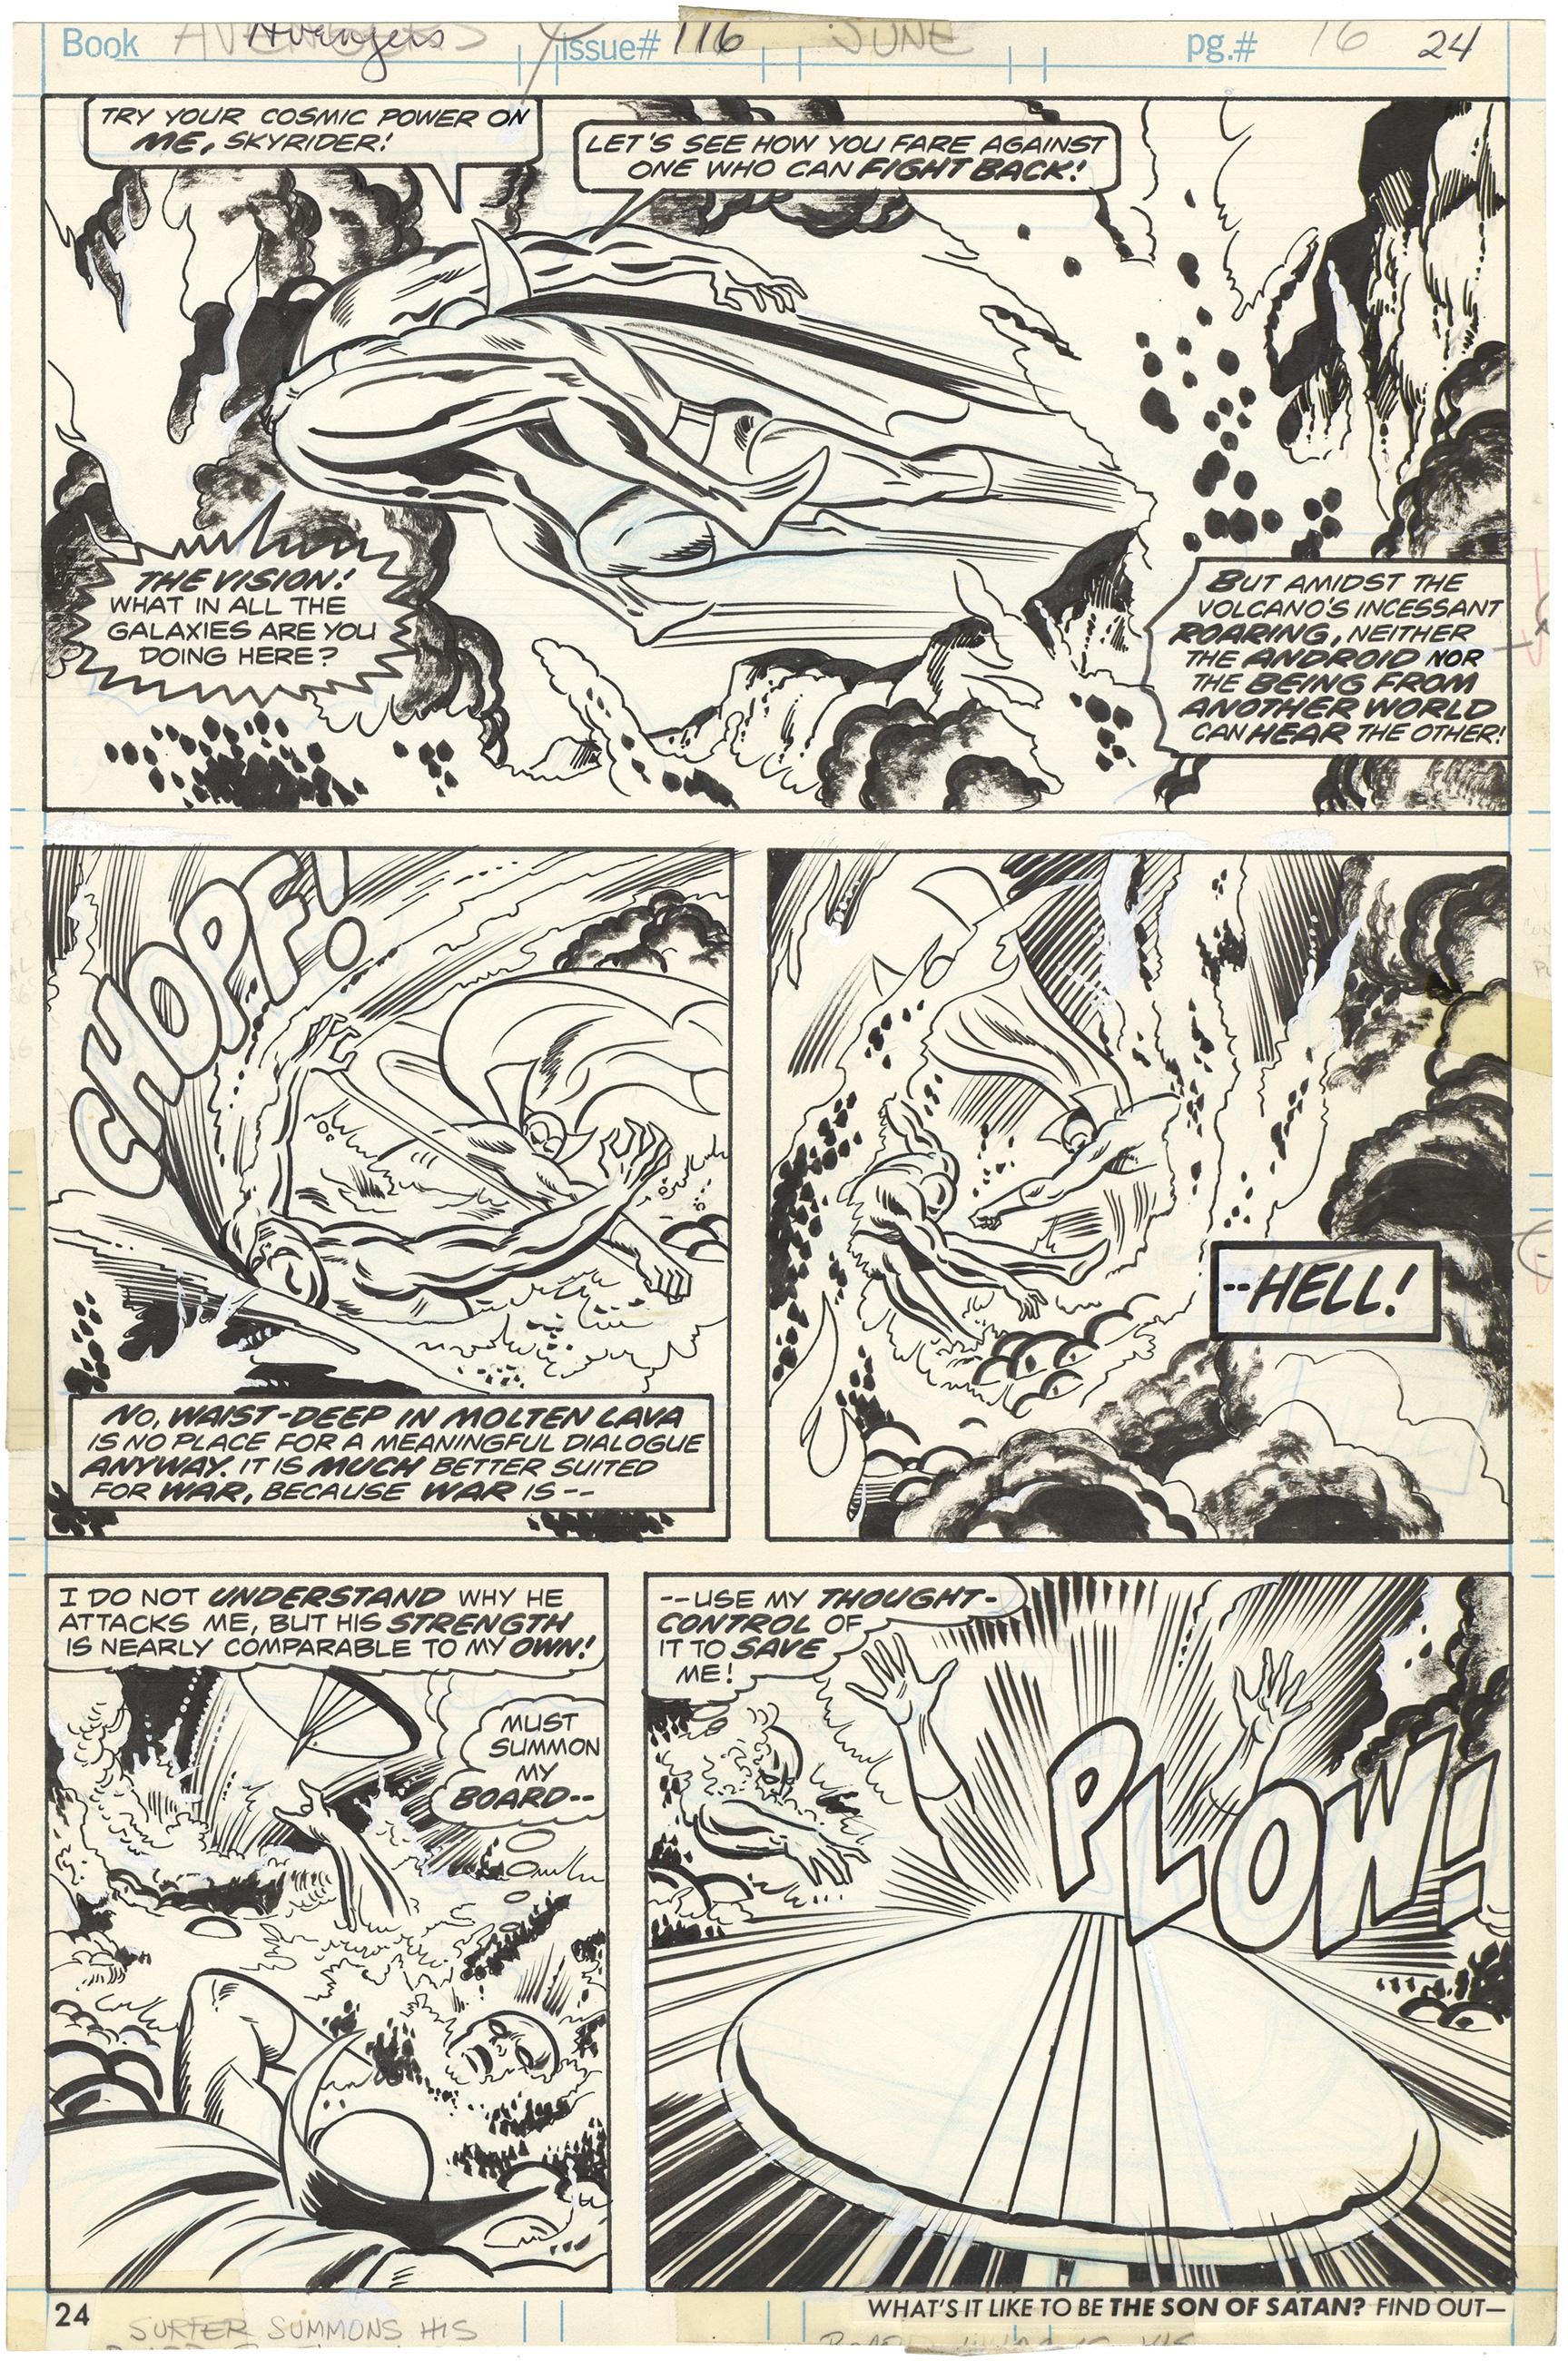 Avengers #116 p24